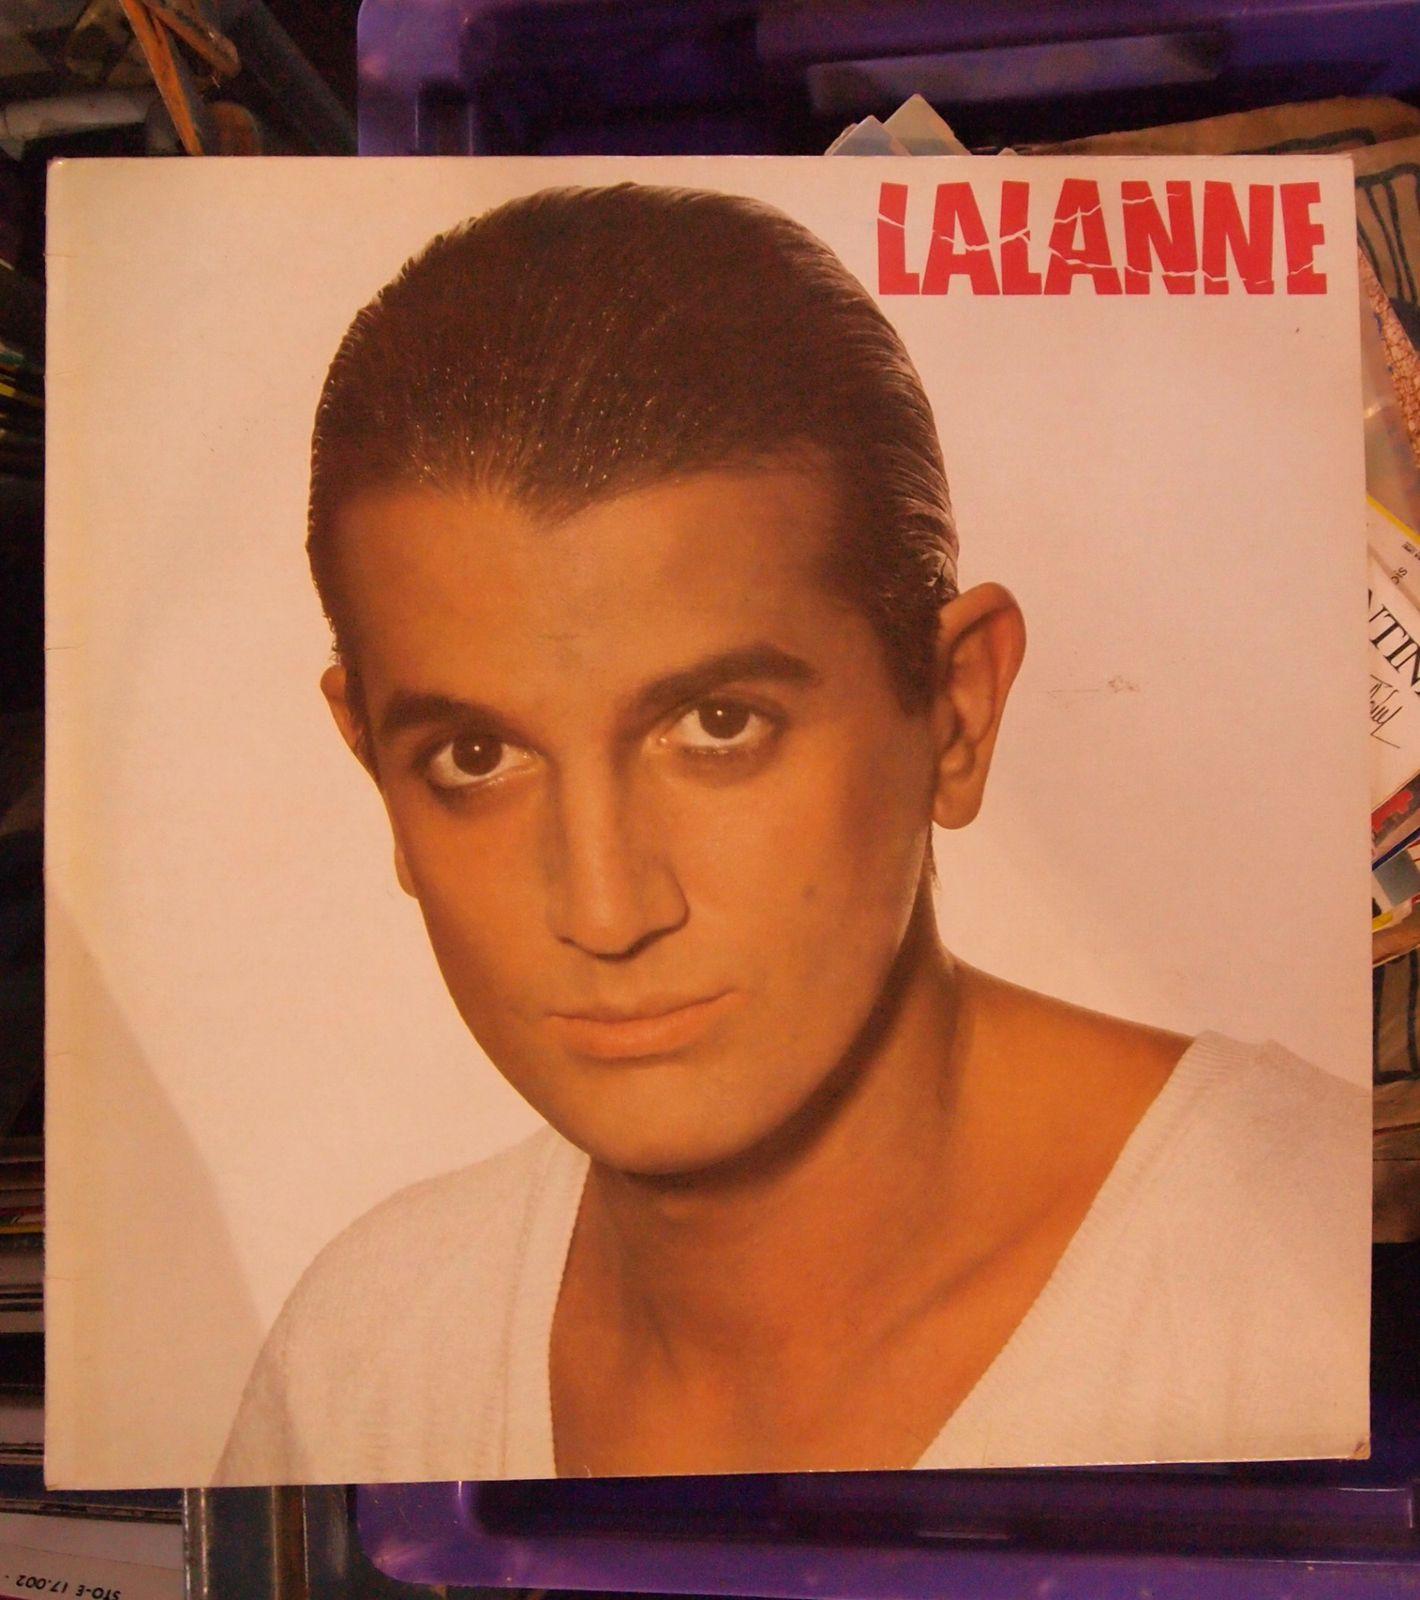 Francis-Lalanne-1981.JPG